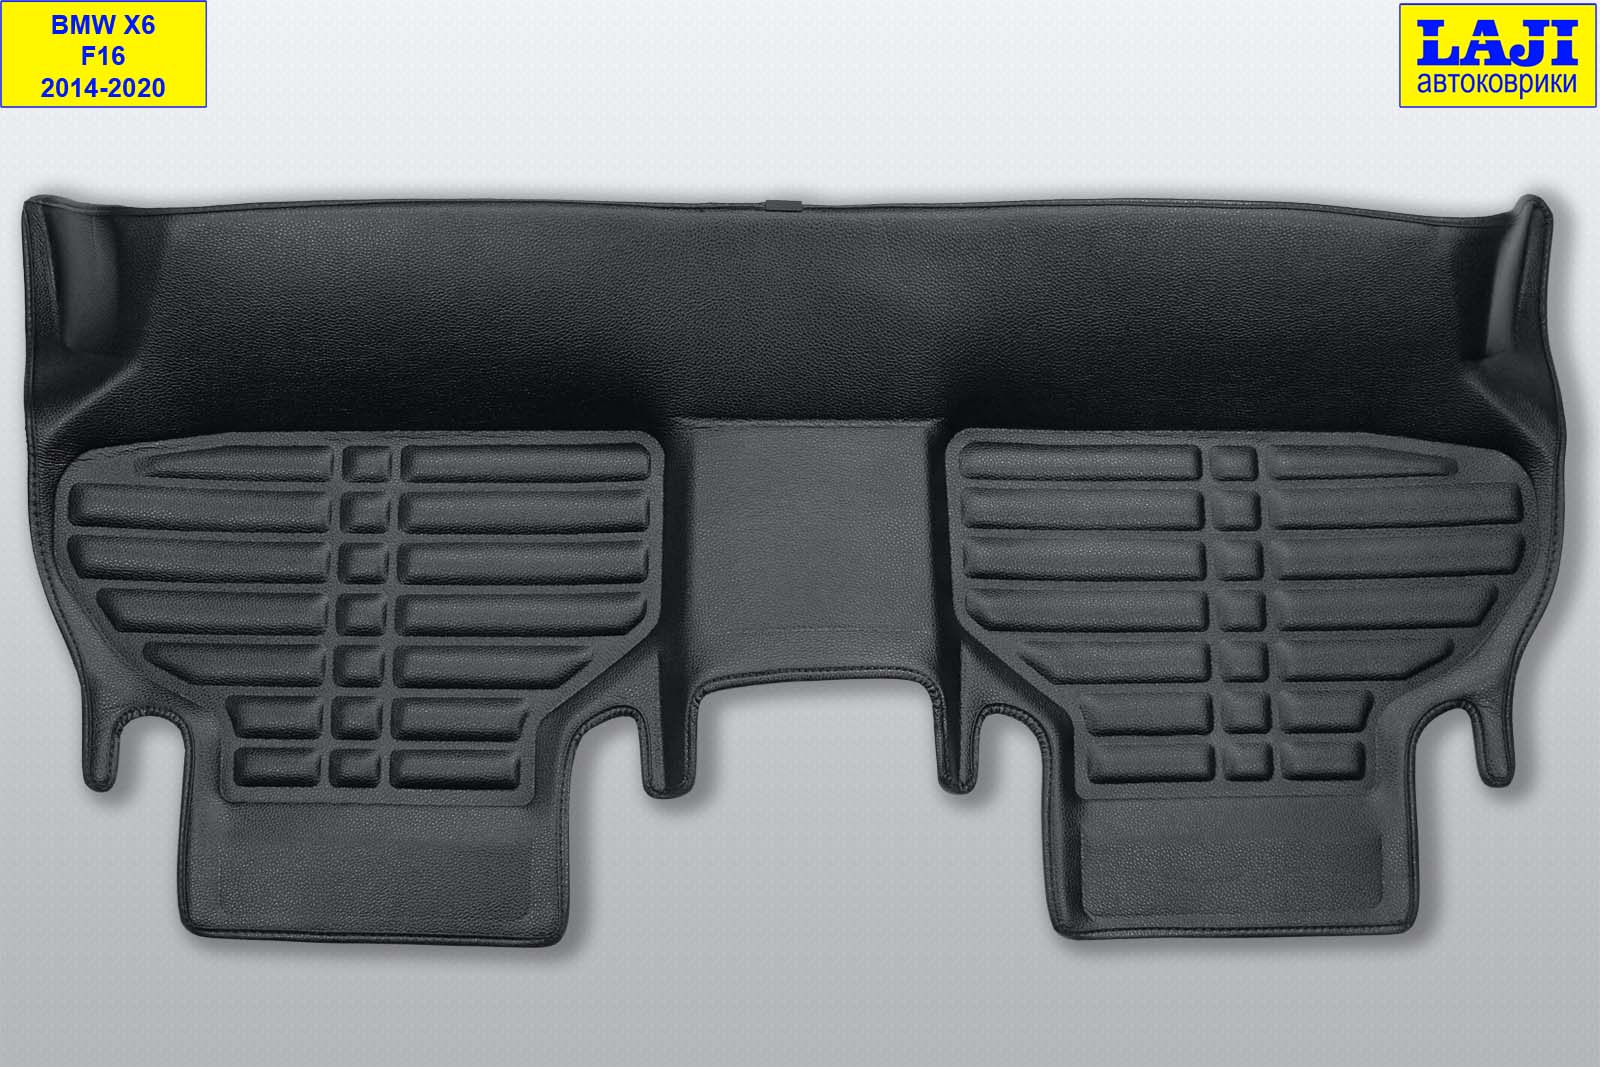 5D коврики в салон BMW X6 (F16) 2014-2020 9